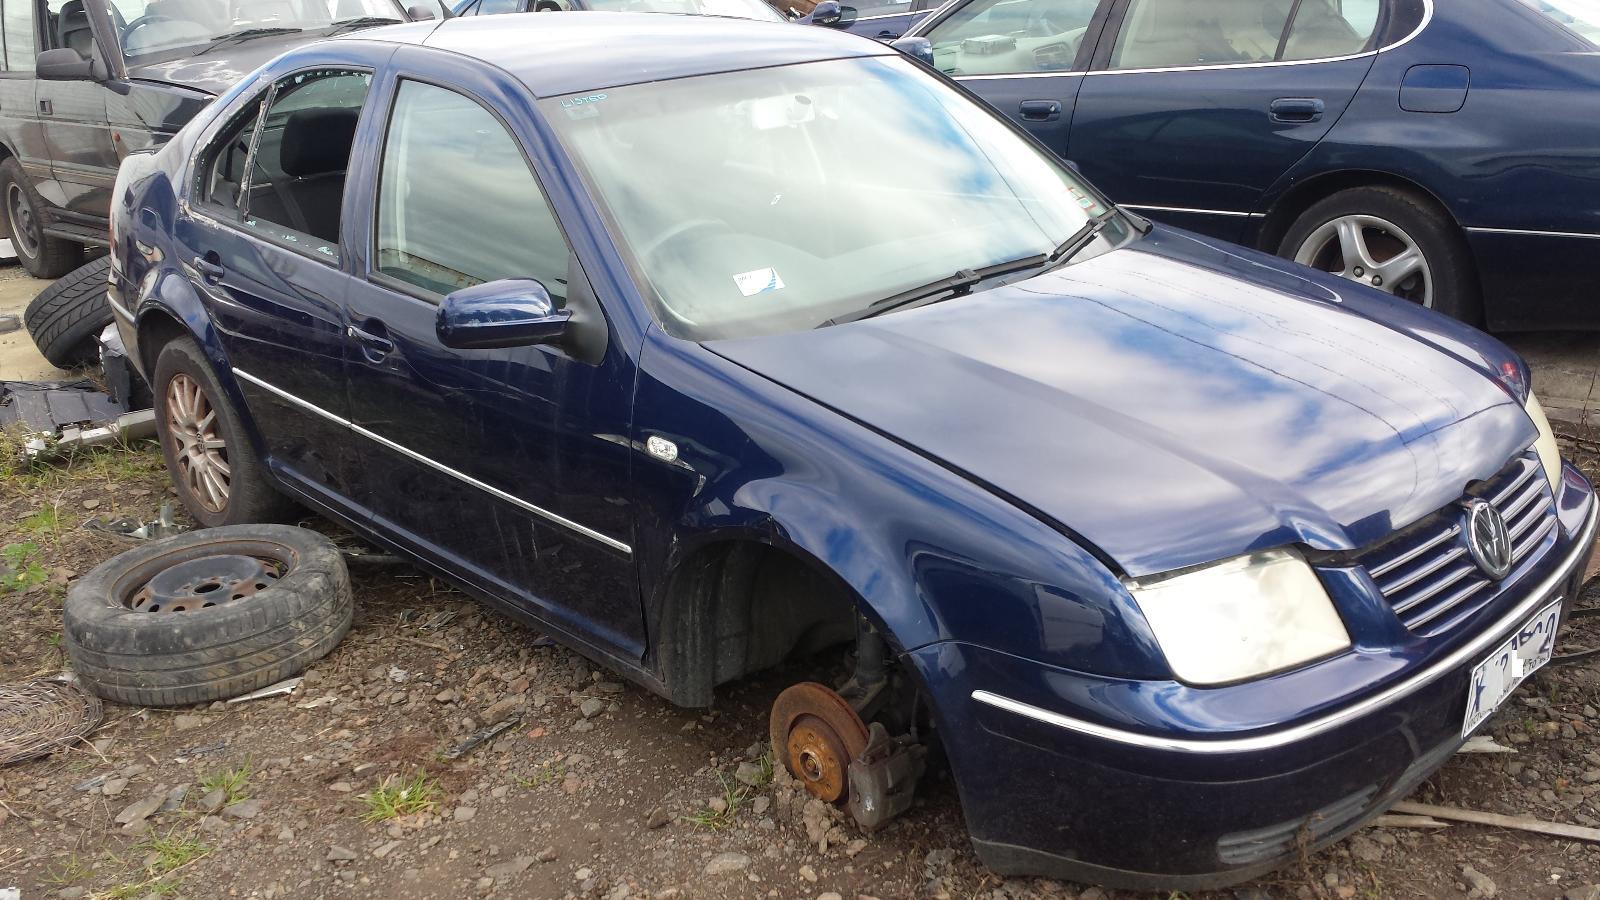 Volkswagen Bora 1J 2.0 Starter Motor 12/99-12/05 Wrecking Car | eBay